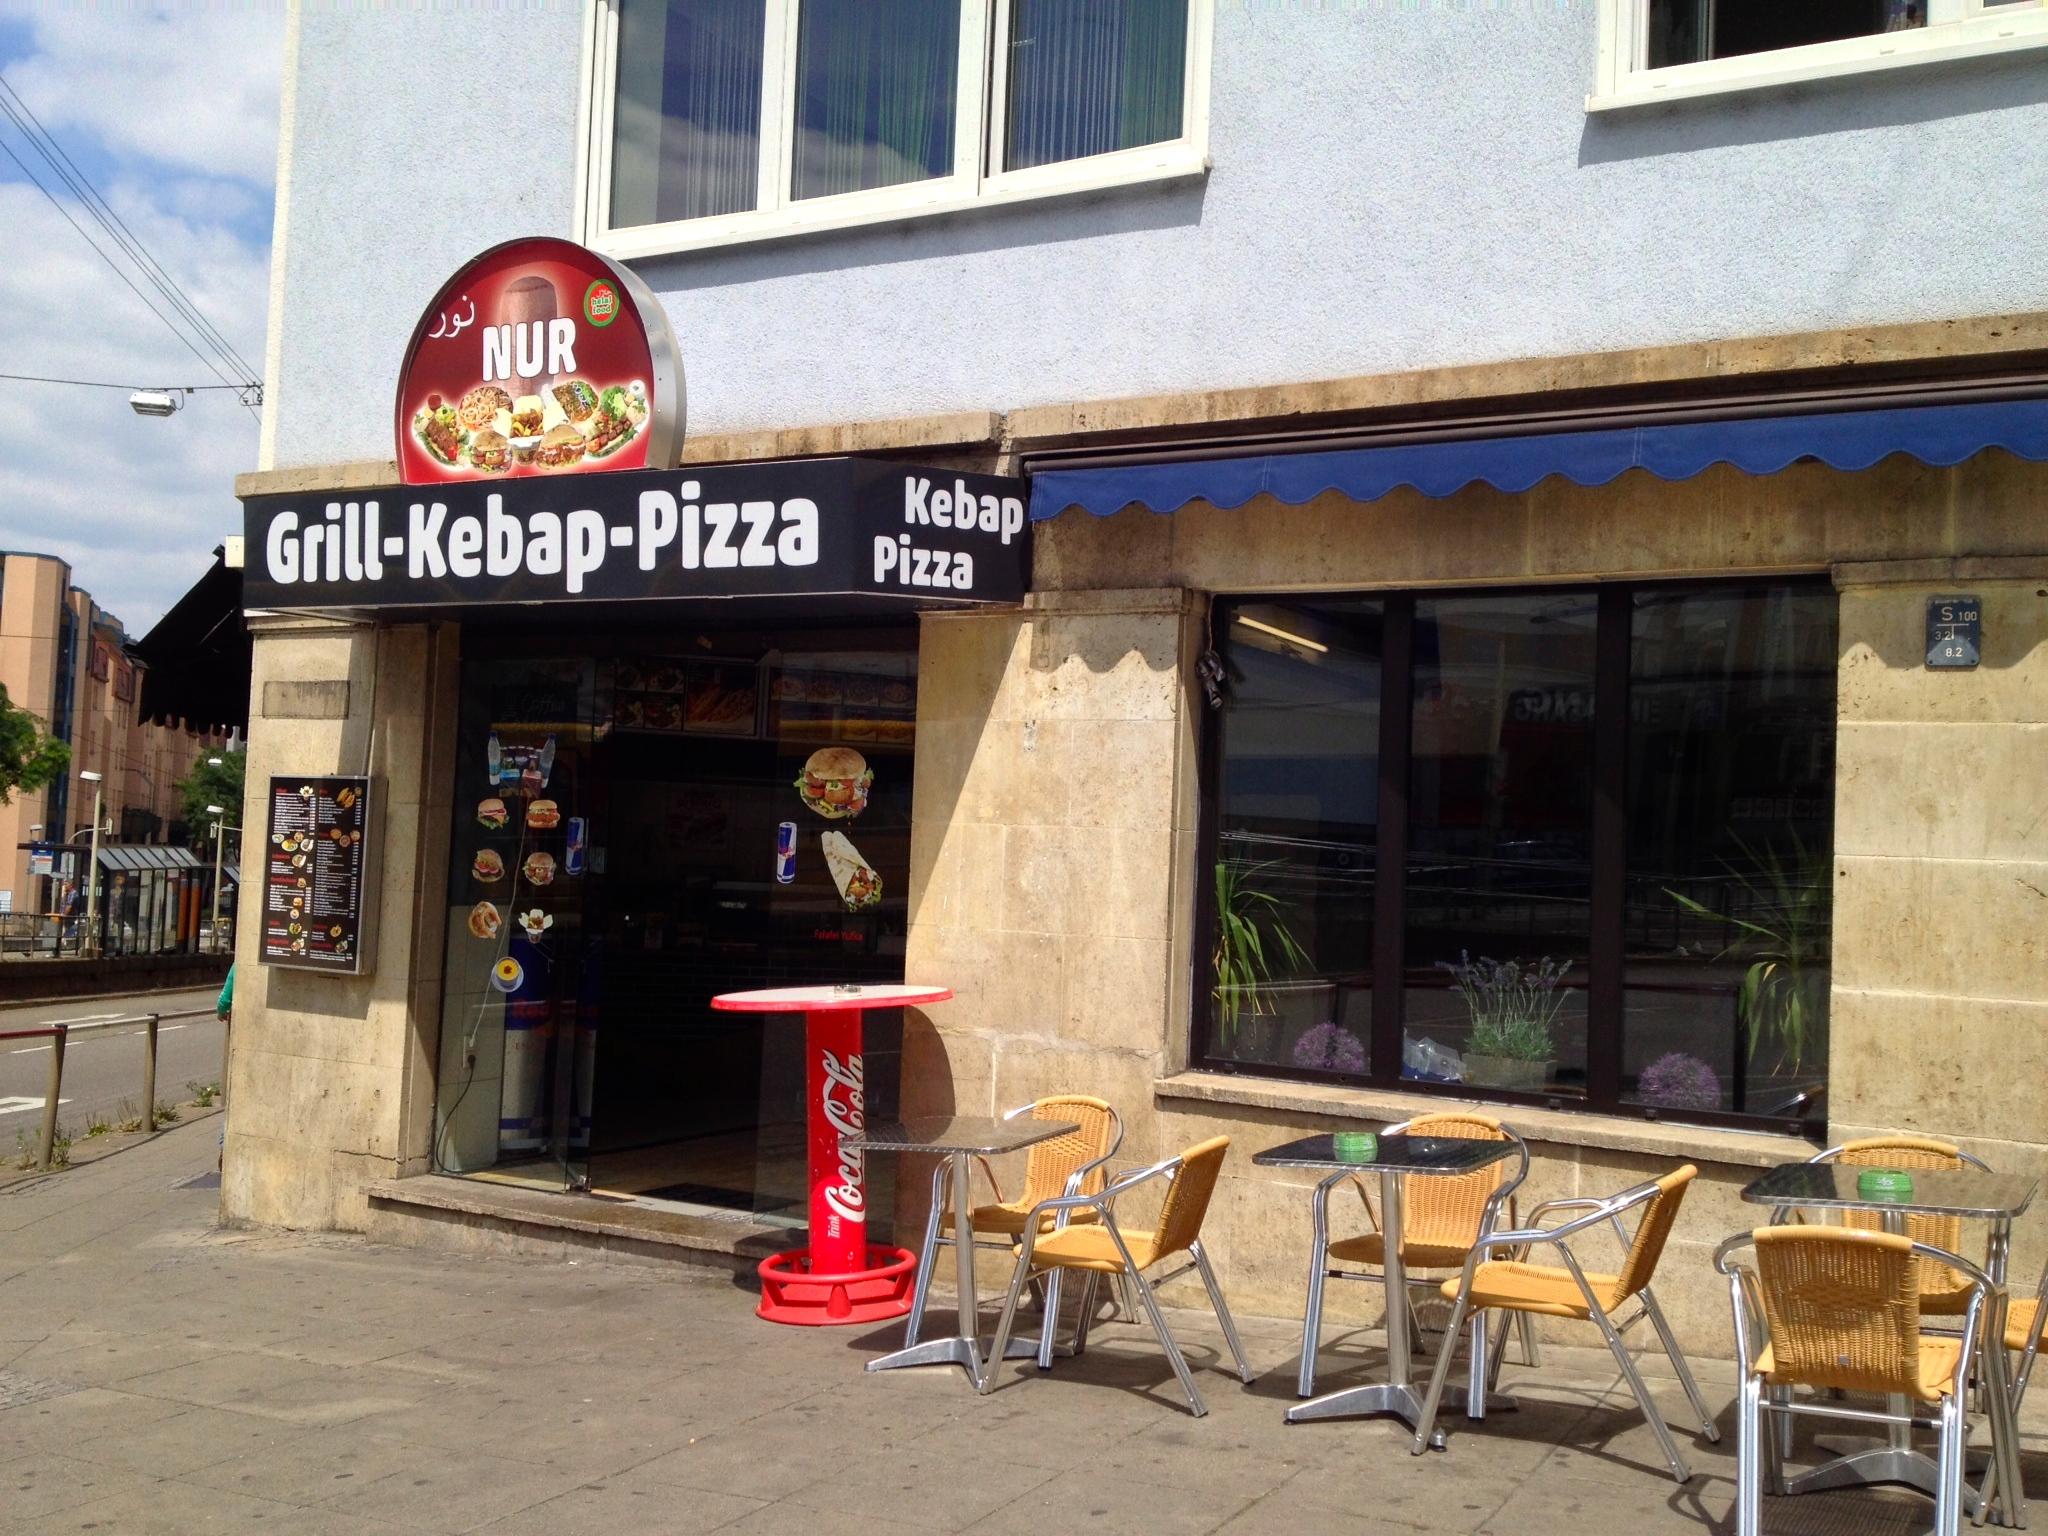 Nur Kebap & Pizza just off of Charlottenstraße.